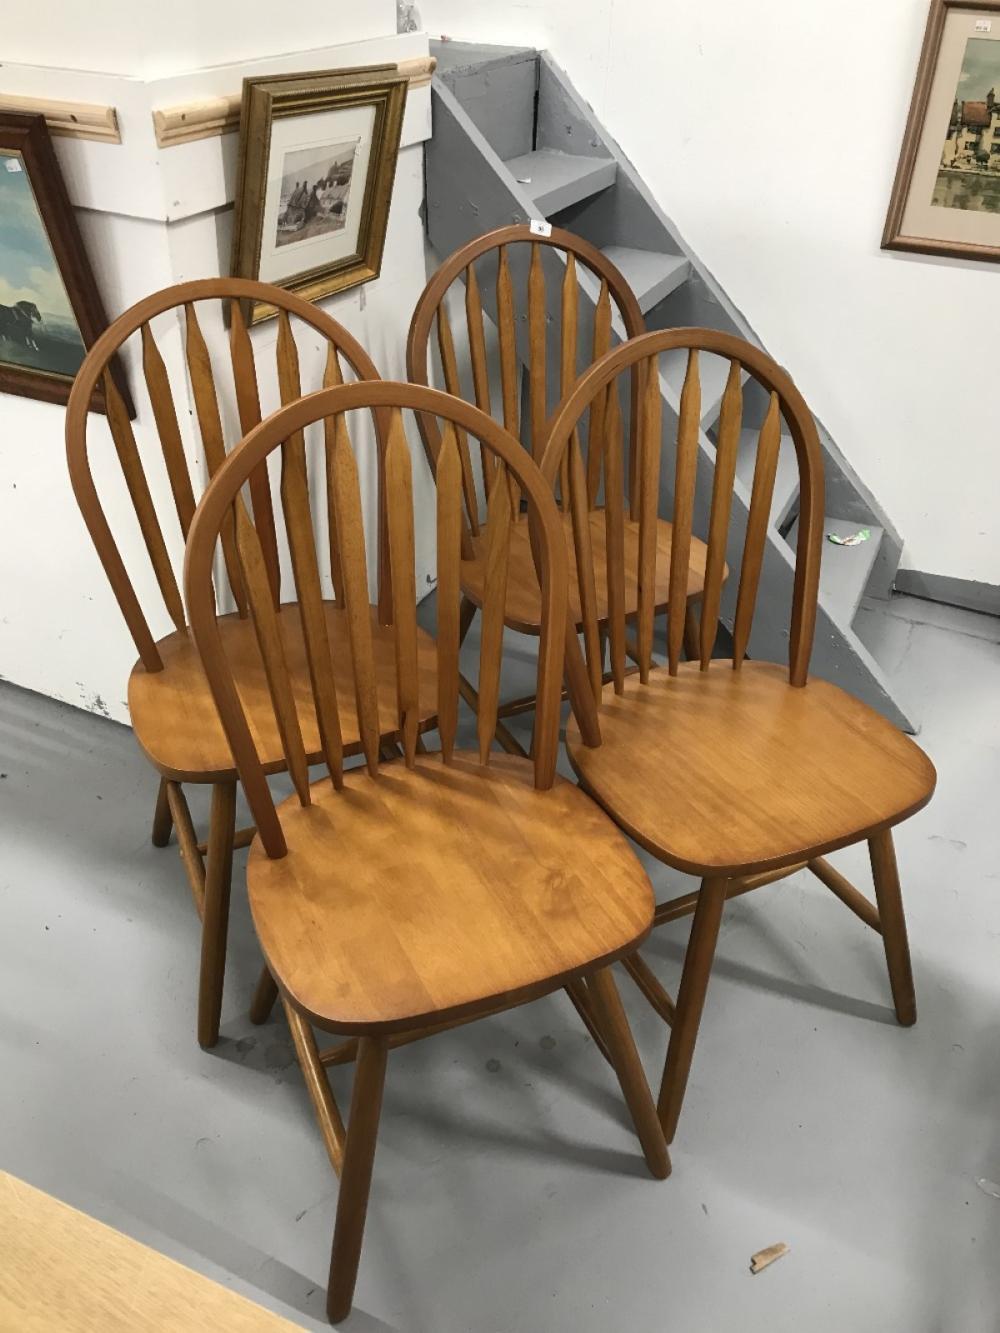 20th cent. Teak dining chairs, stick backs x 4.